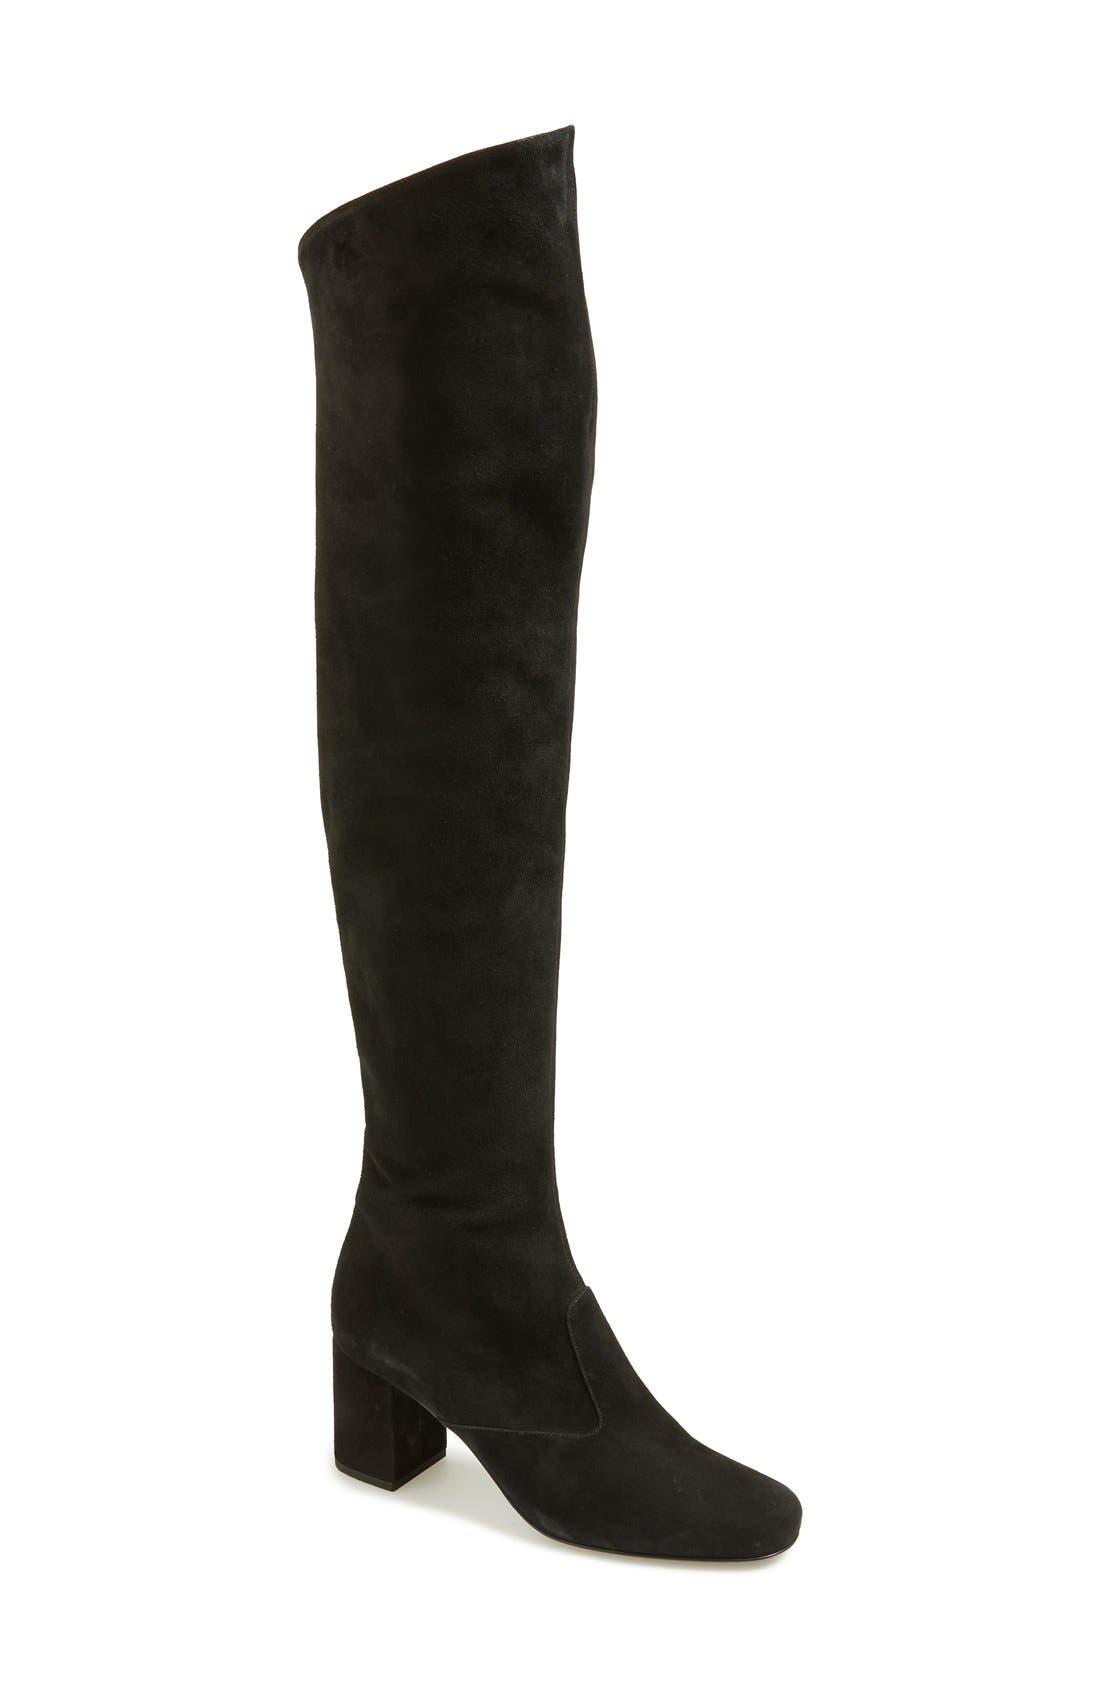 Alternate Image 1 Selected - Saint Laurent 'Babies' Over the Knee Boot (Women)